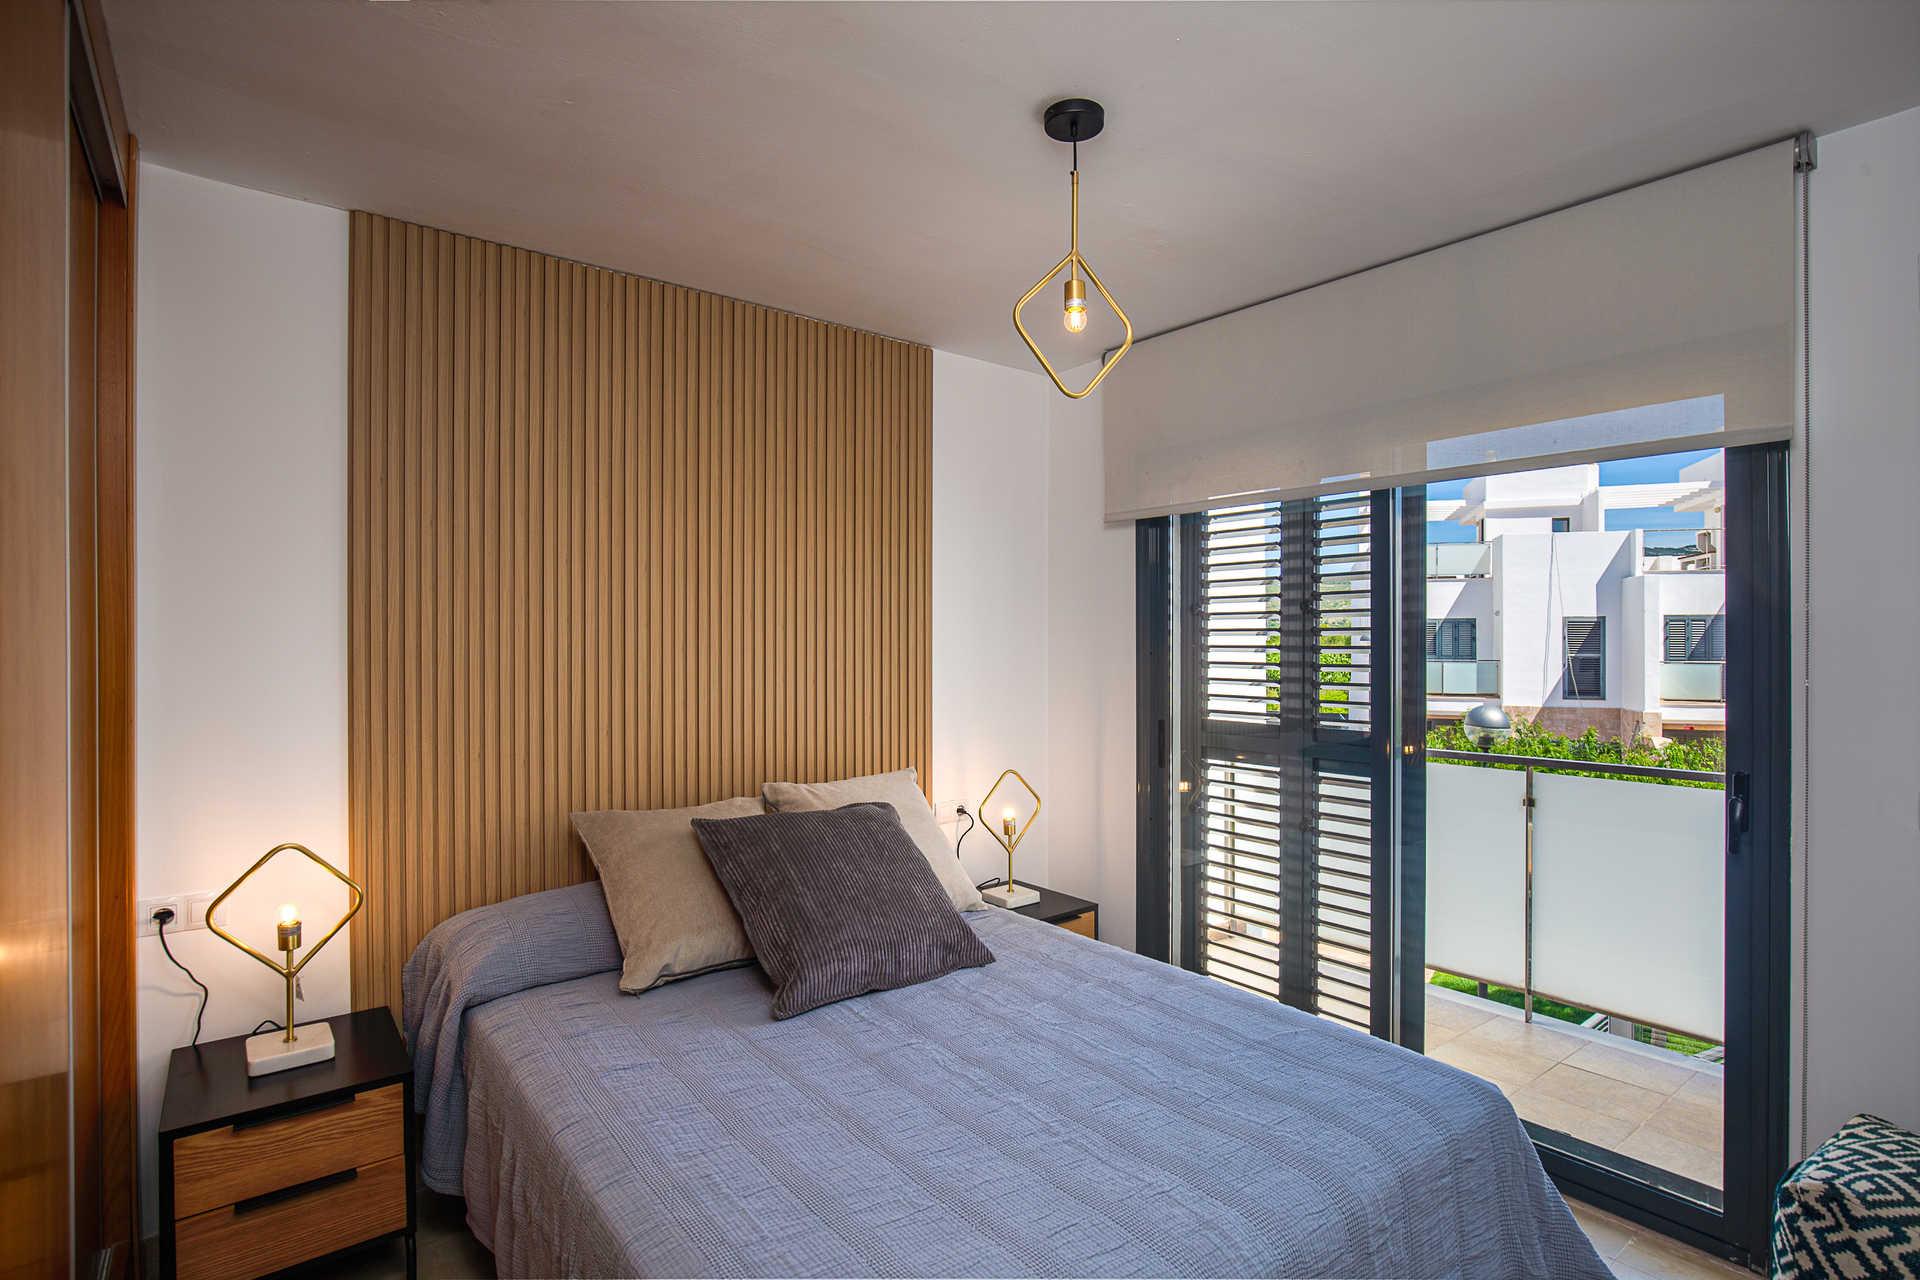 VILLAS DULCINEA DE FANTASIA HOTELES